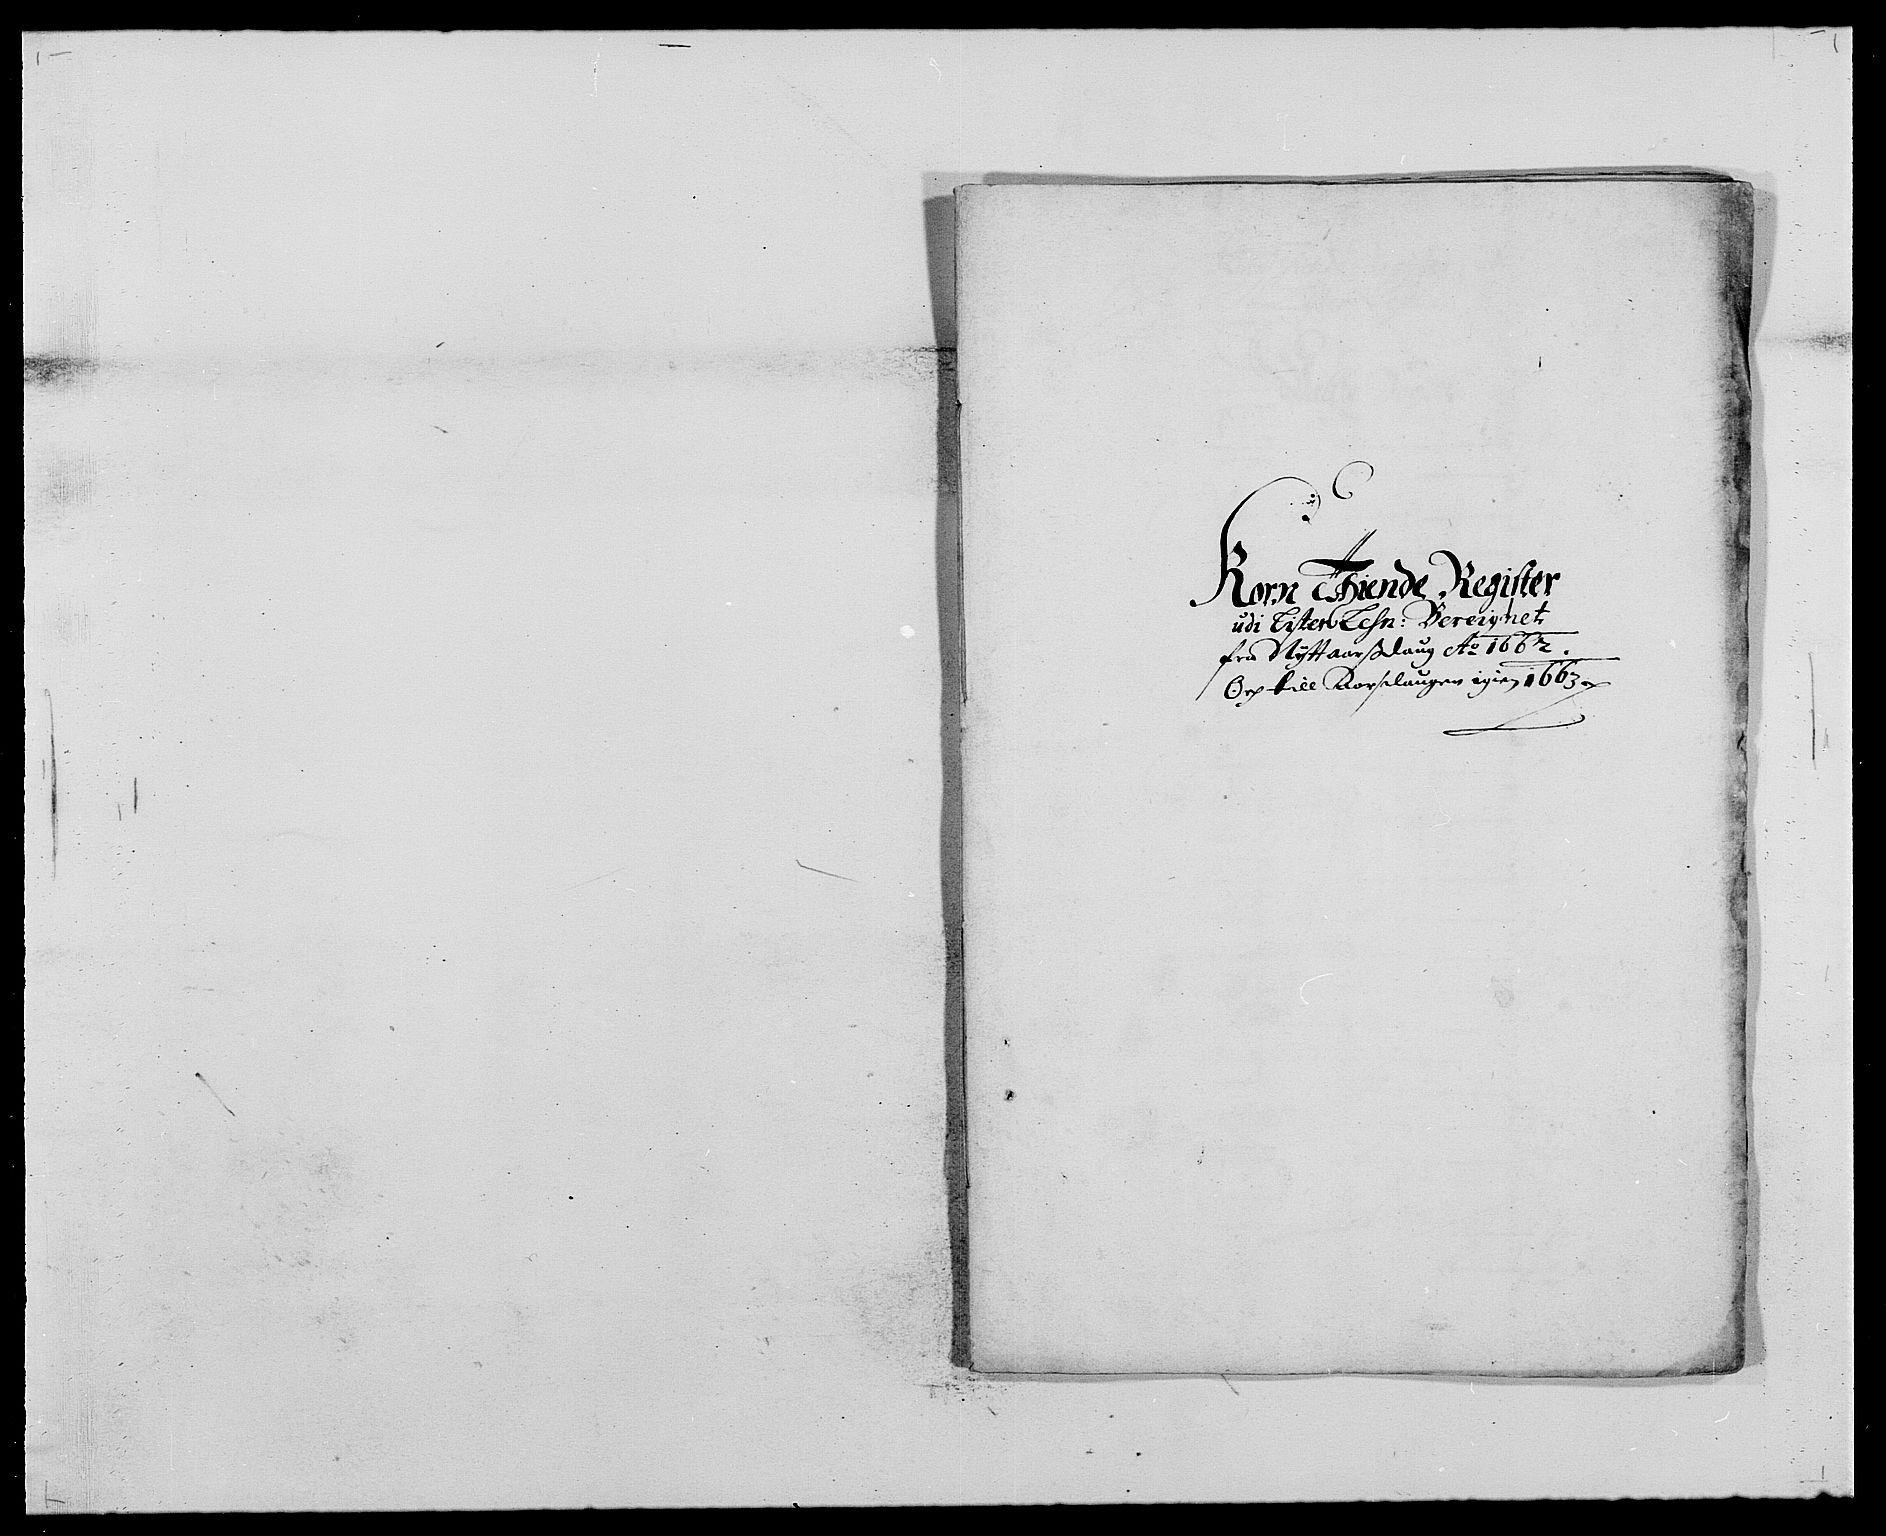 RA, Rentekammeret inntil 1814, Reviderte regnskaper, Fogderegnskap, R41/L2522: Fogderegnskap Lista, 1662, s. 48